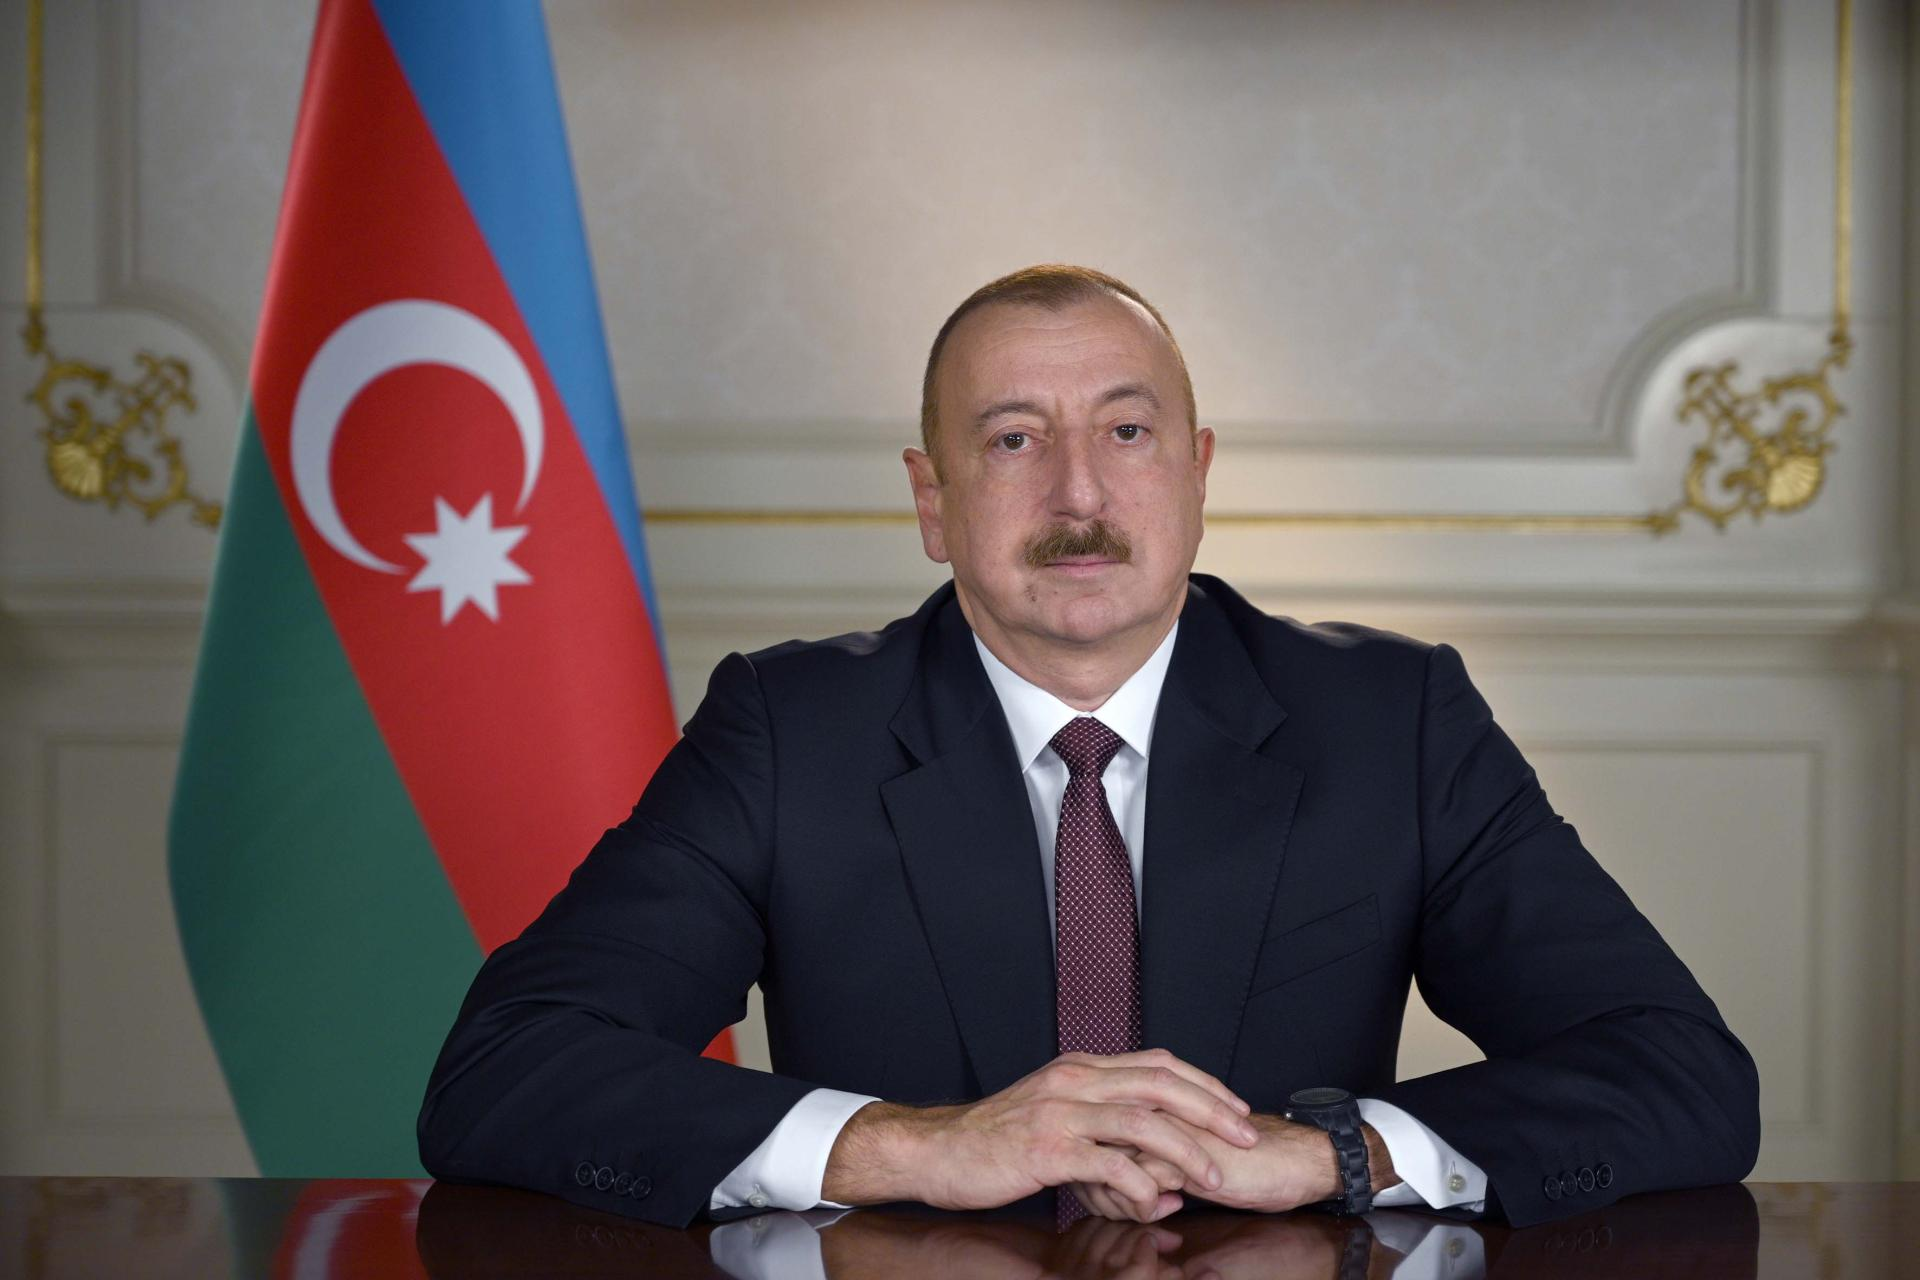 2020/03/ilham_aliyev_main_new_president_310120_1_1584082534.jpg